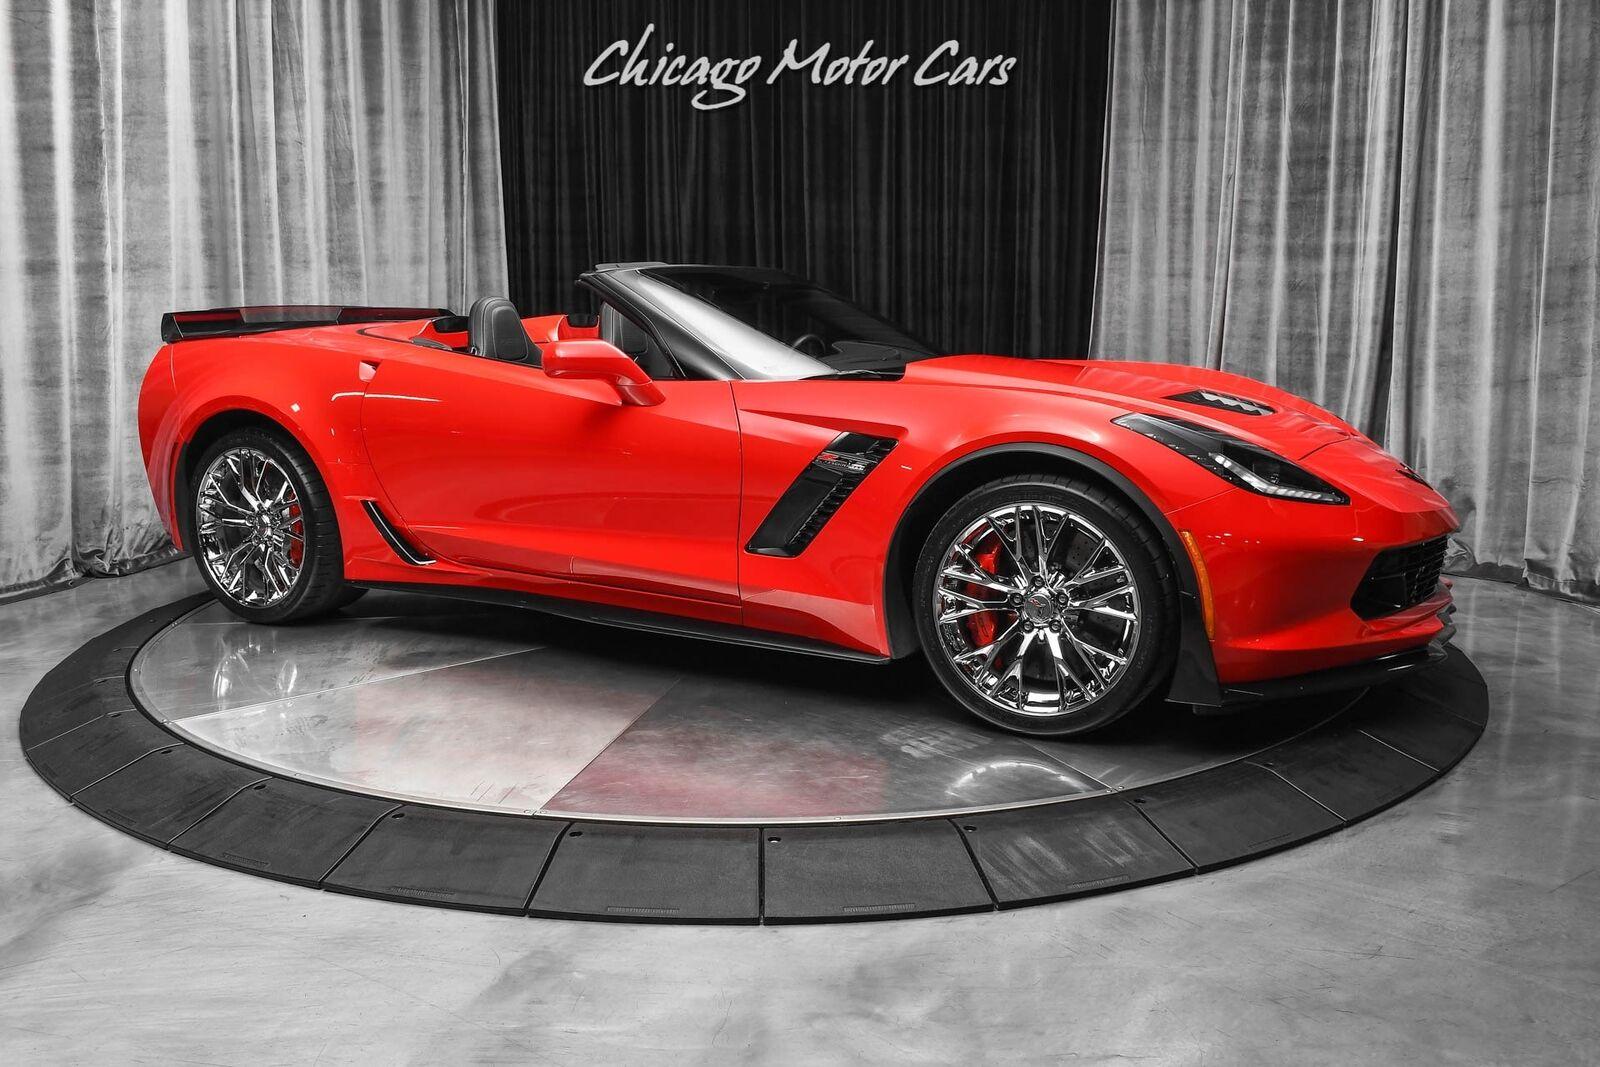 2015 Red Chevrolet Corvette Z06 2LZ | C7 Corvette Photo 6